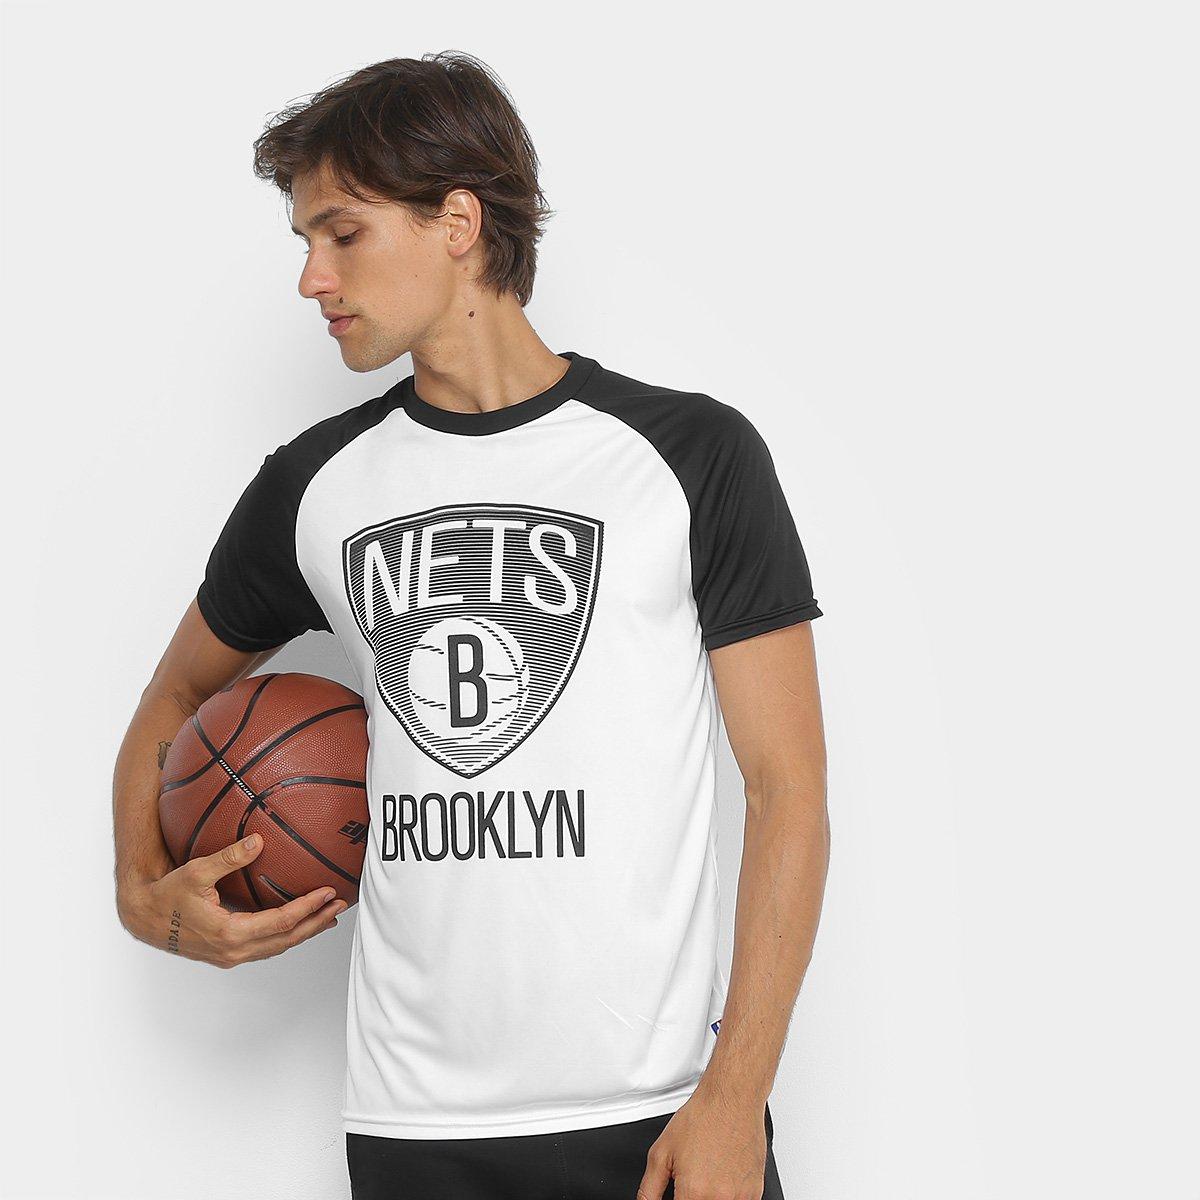 f6b6d6493 Camiseta NBA Brooklyn Nets Masculina - Branco e Preto - Compre Agora ...